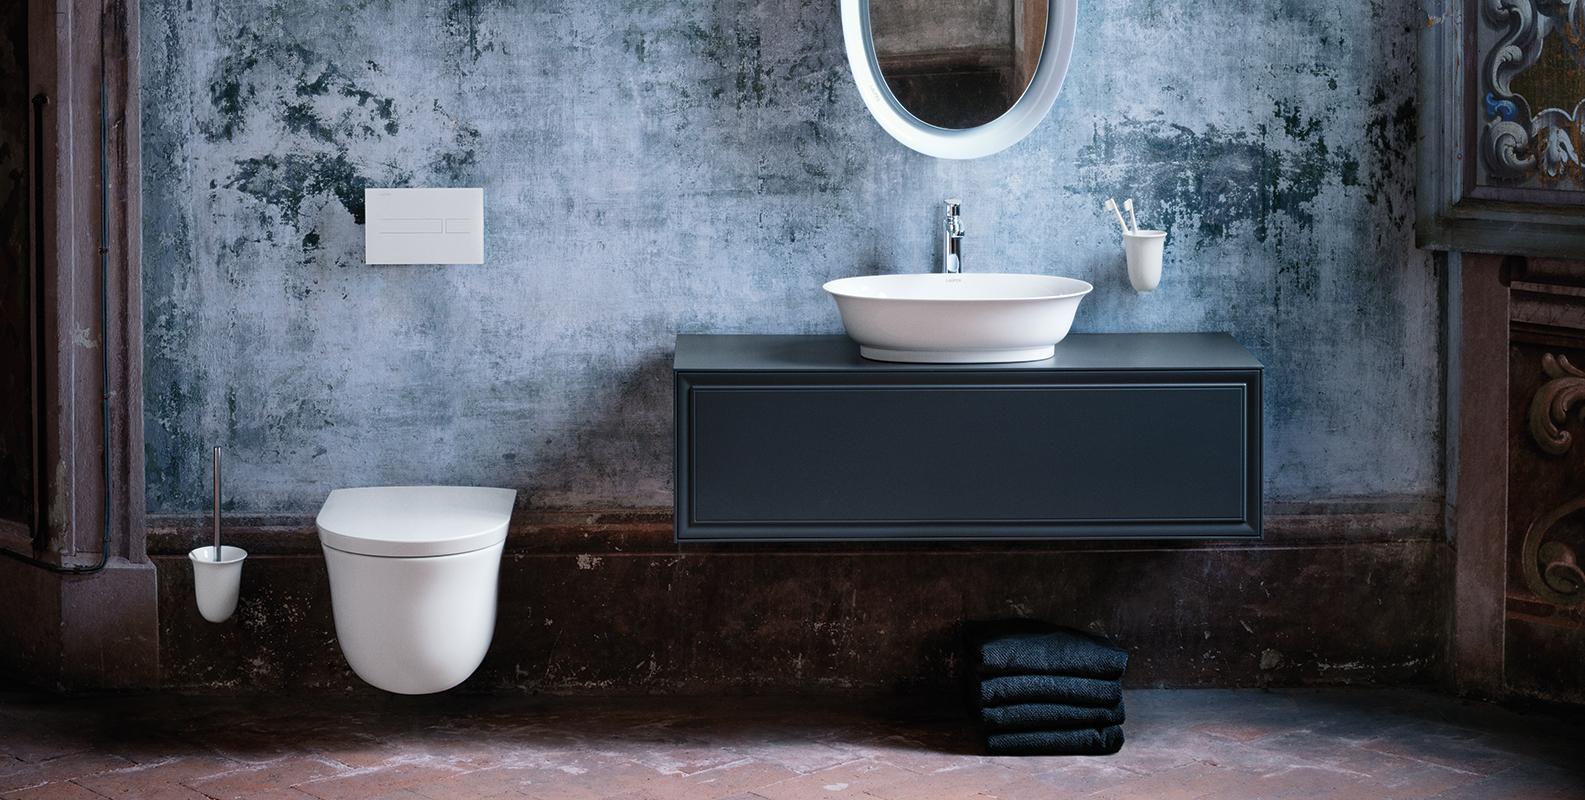 TheNewClassic, Wanders, design, collection, novelties, designer, bathroom, laufen